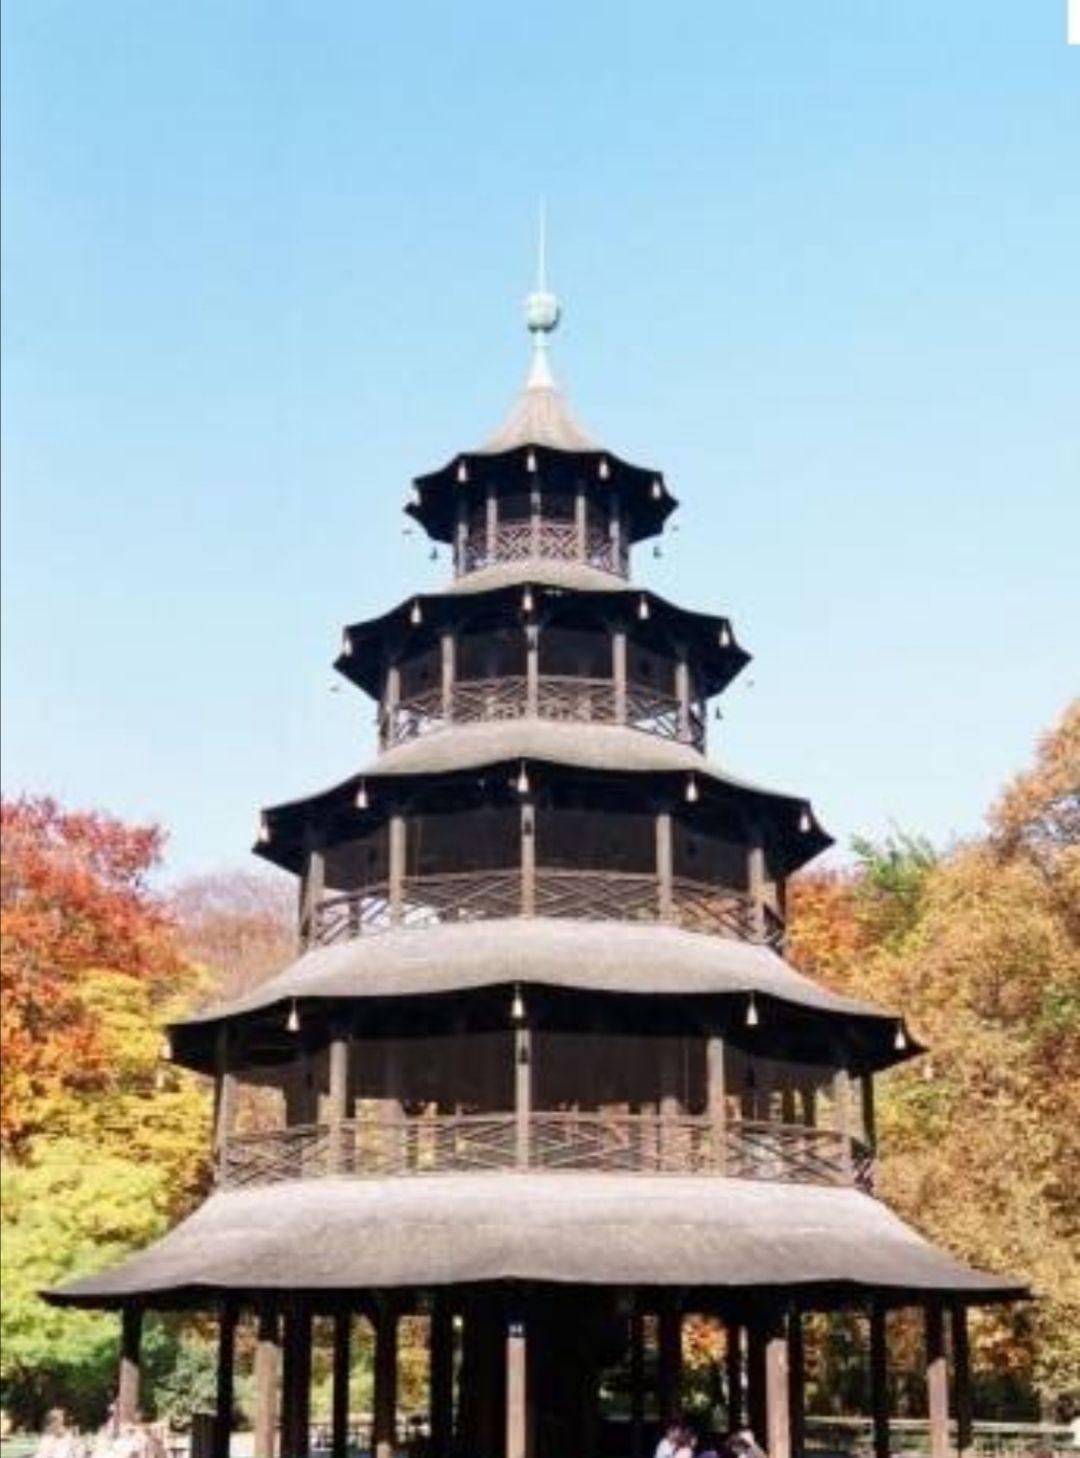 China Garten Neu Chinesischer Turm attractions Zoe爷 Munich Travel Review